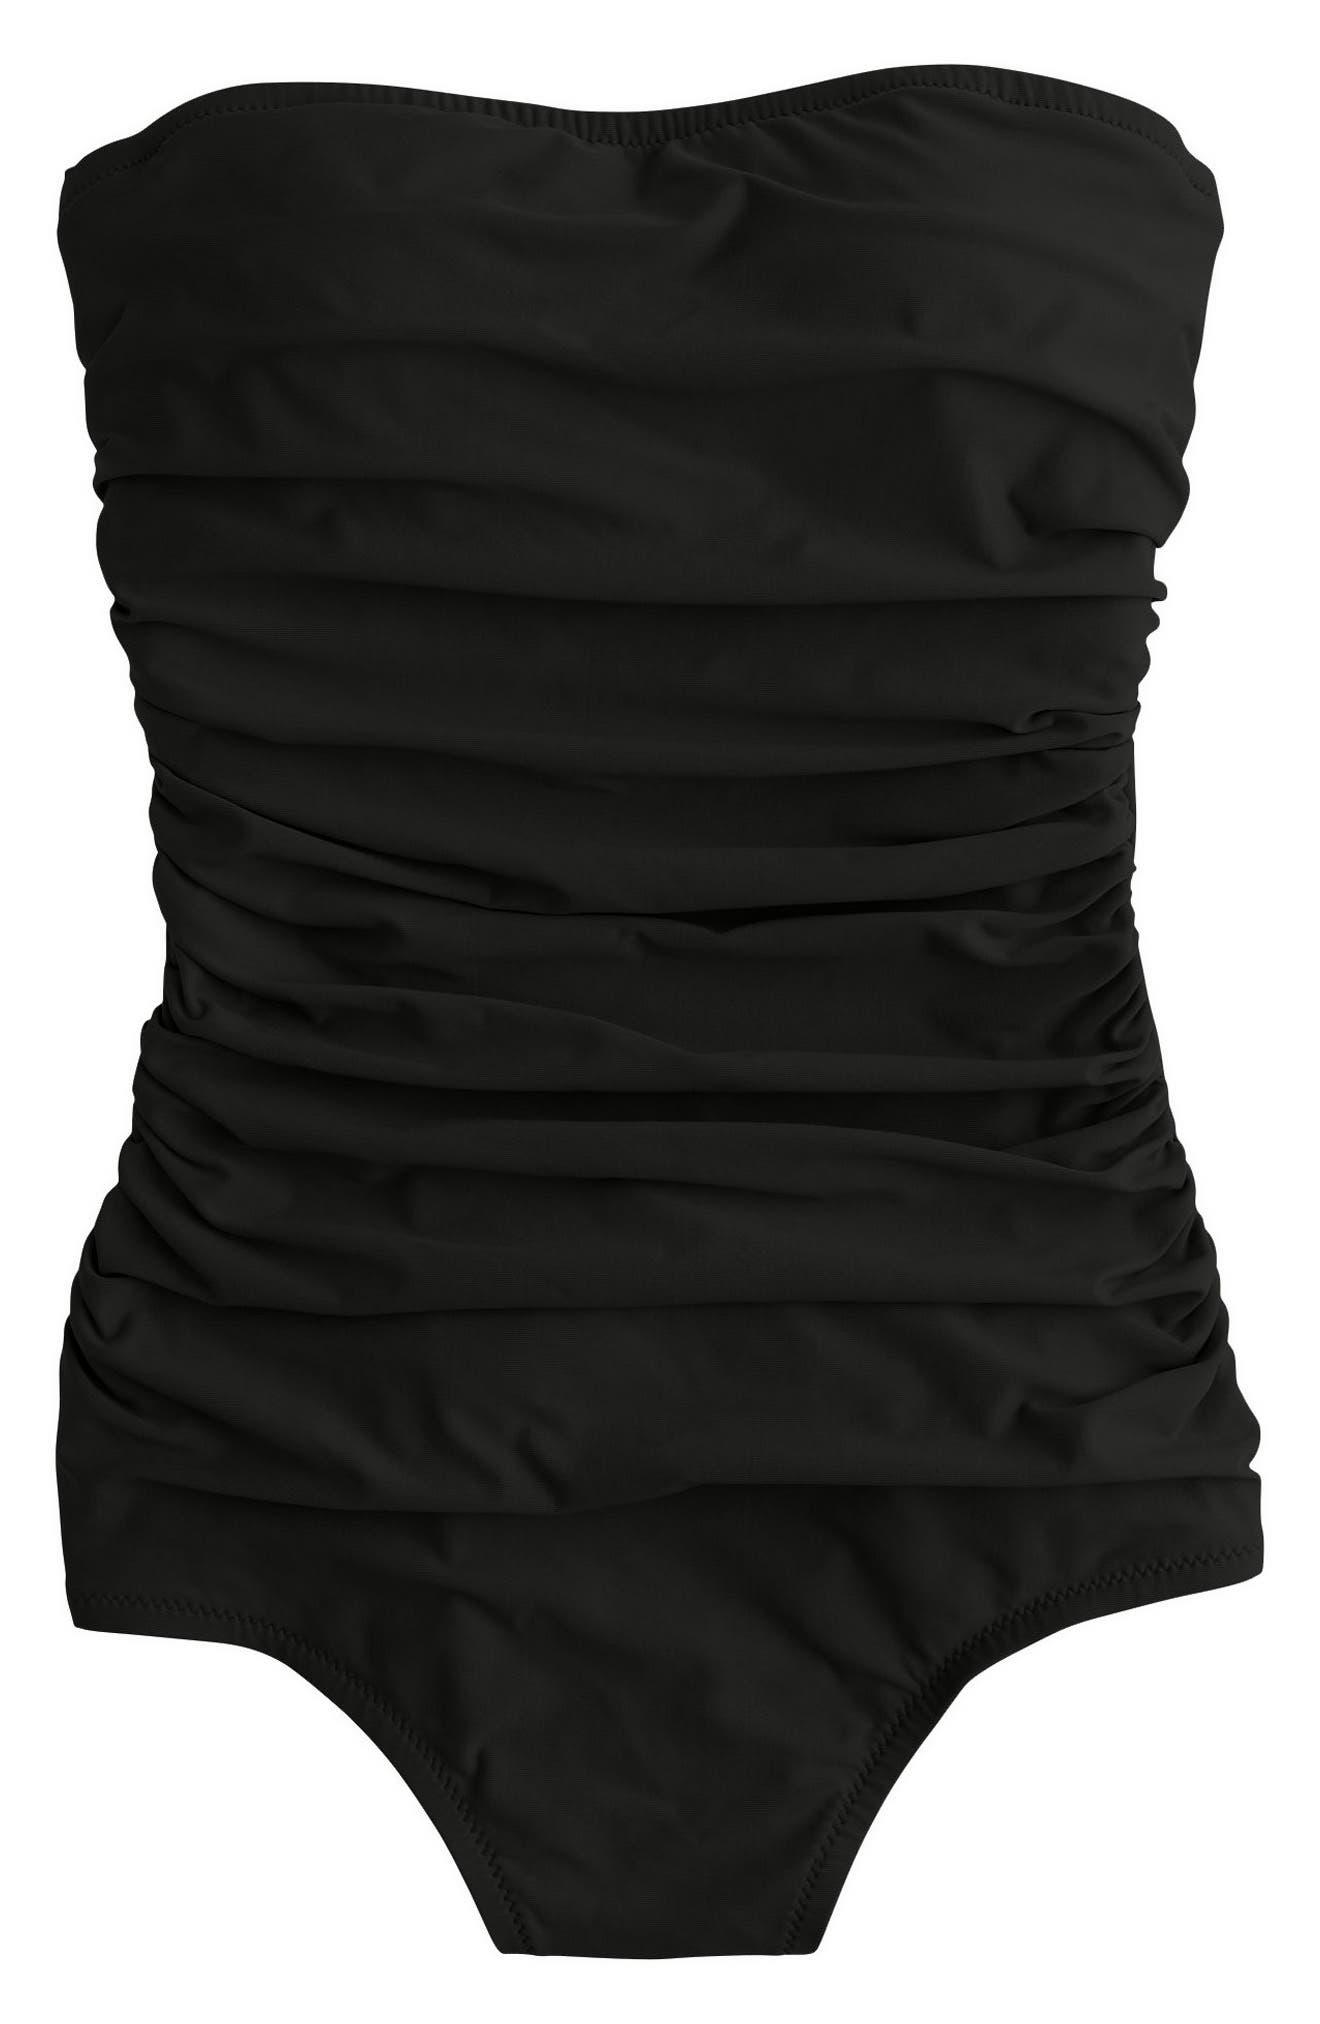 J.CREW Ruched One-Piece Bandeau Swimsuit, Main, color, 001